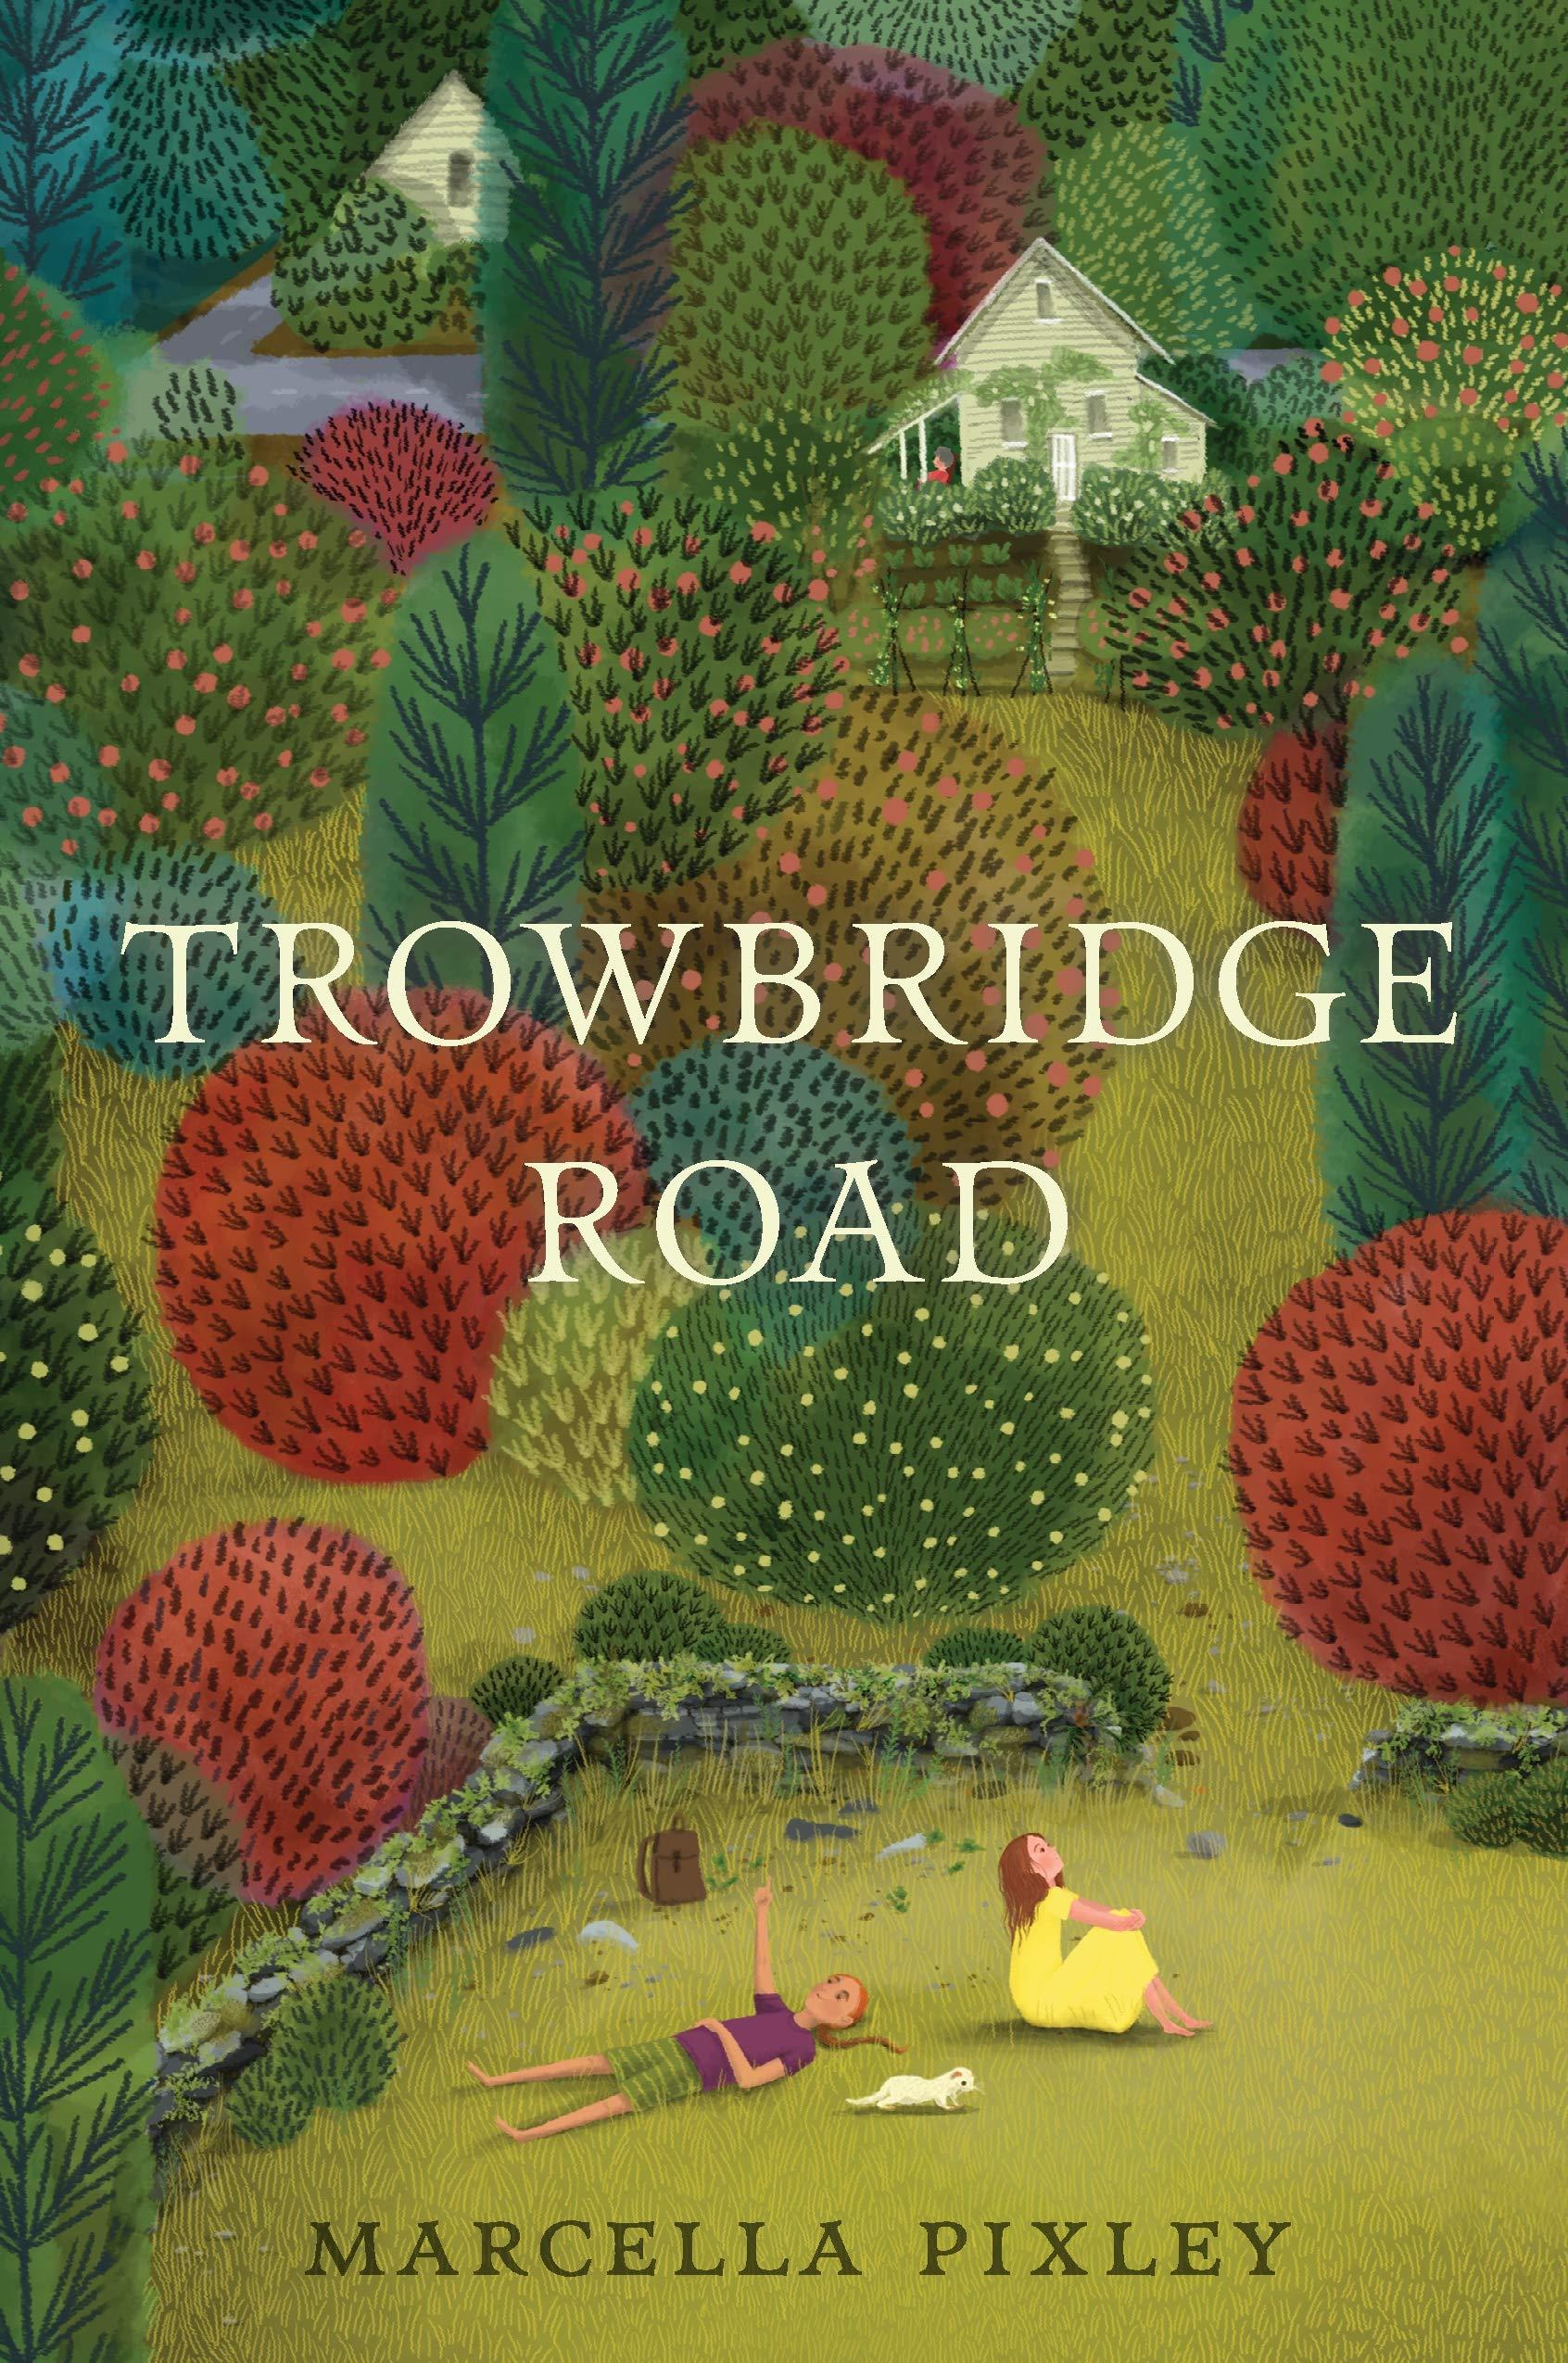 Trowbridge Road: Marcella Pixley: 9781536207507: Amazon.com: Books